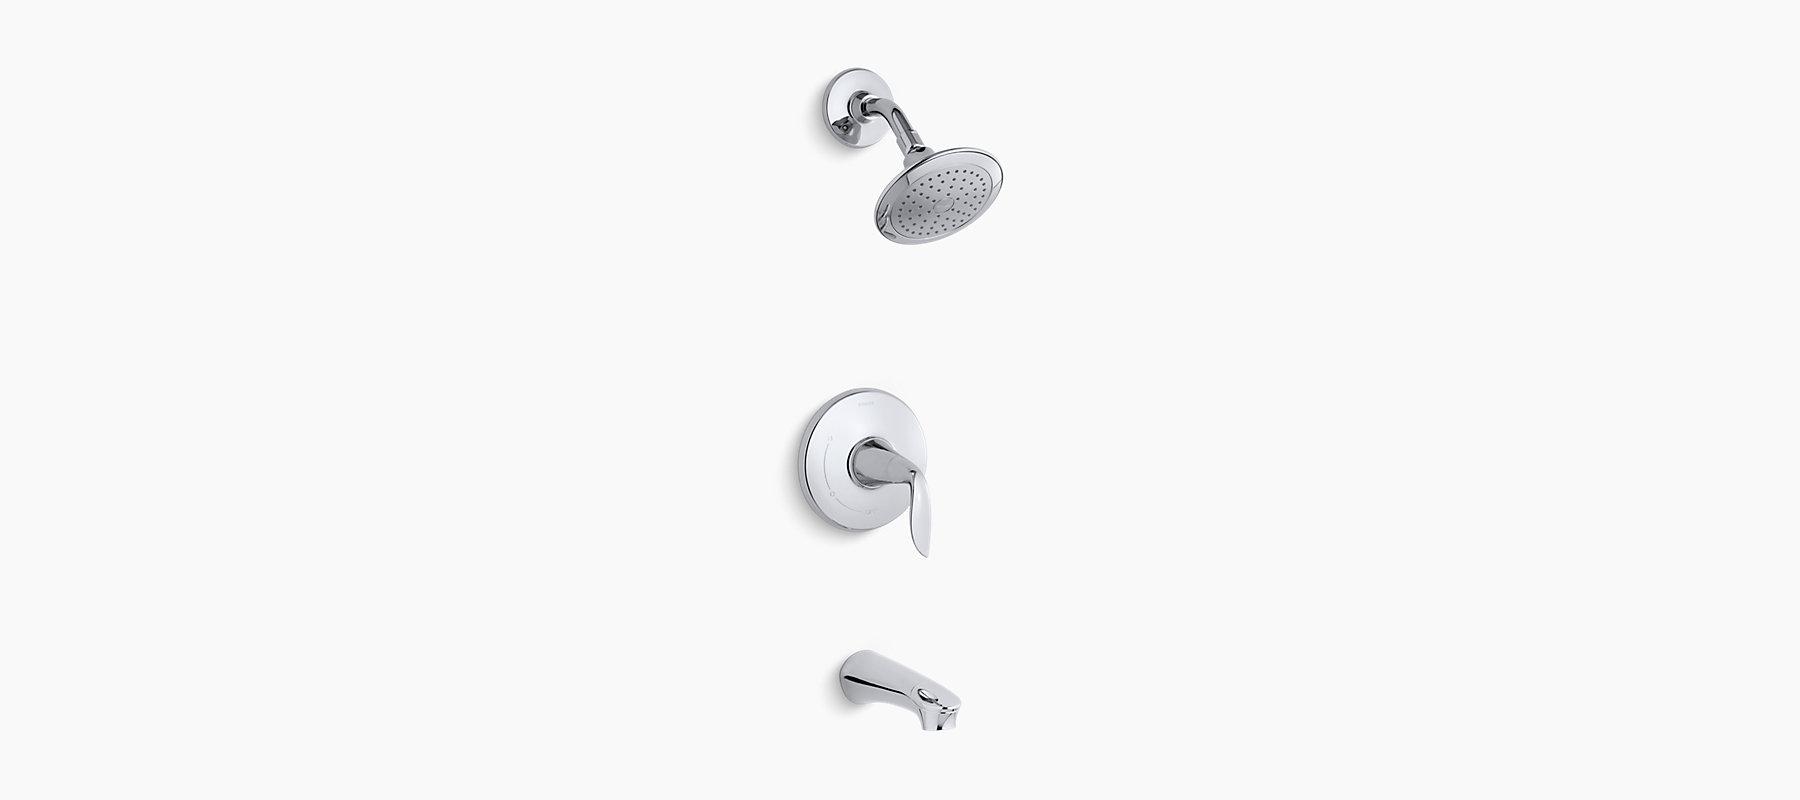 K-T5318-4   Refinia bath and shower trim, valve not included   KOHLER